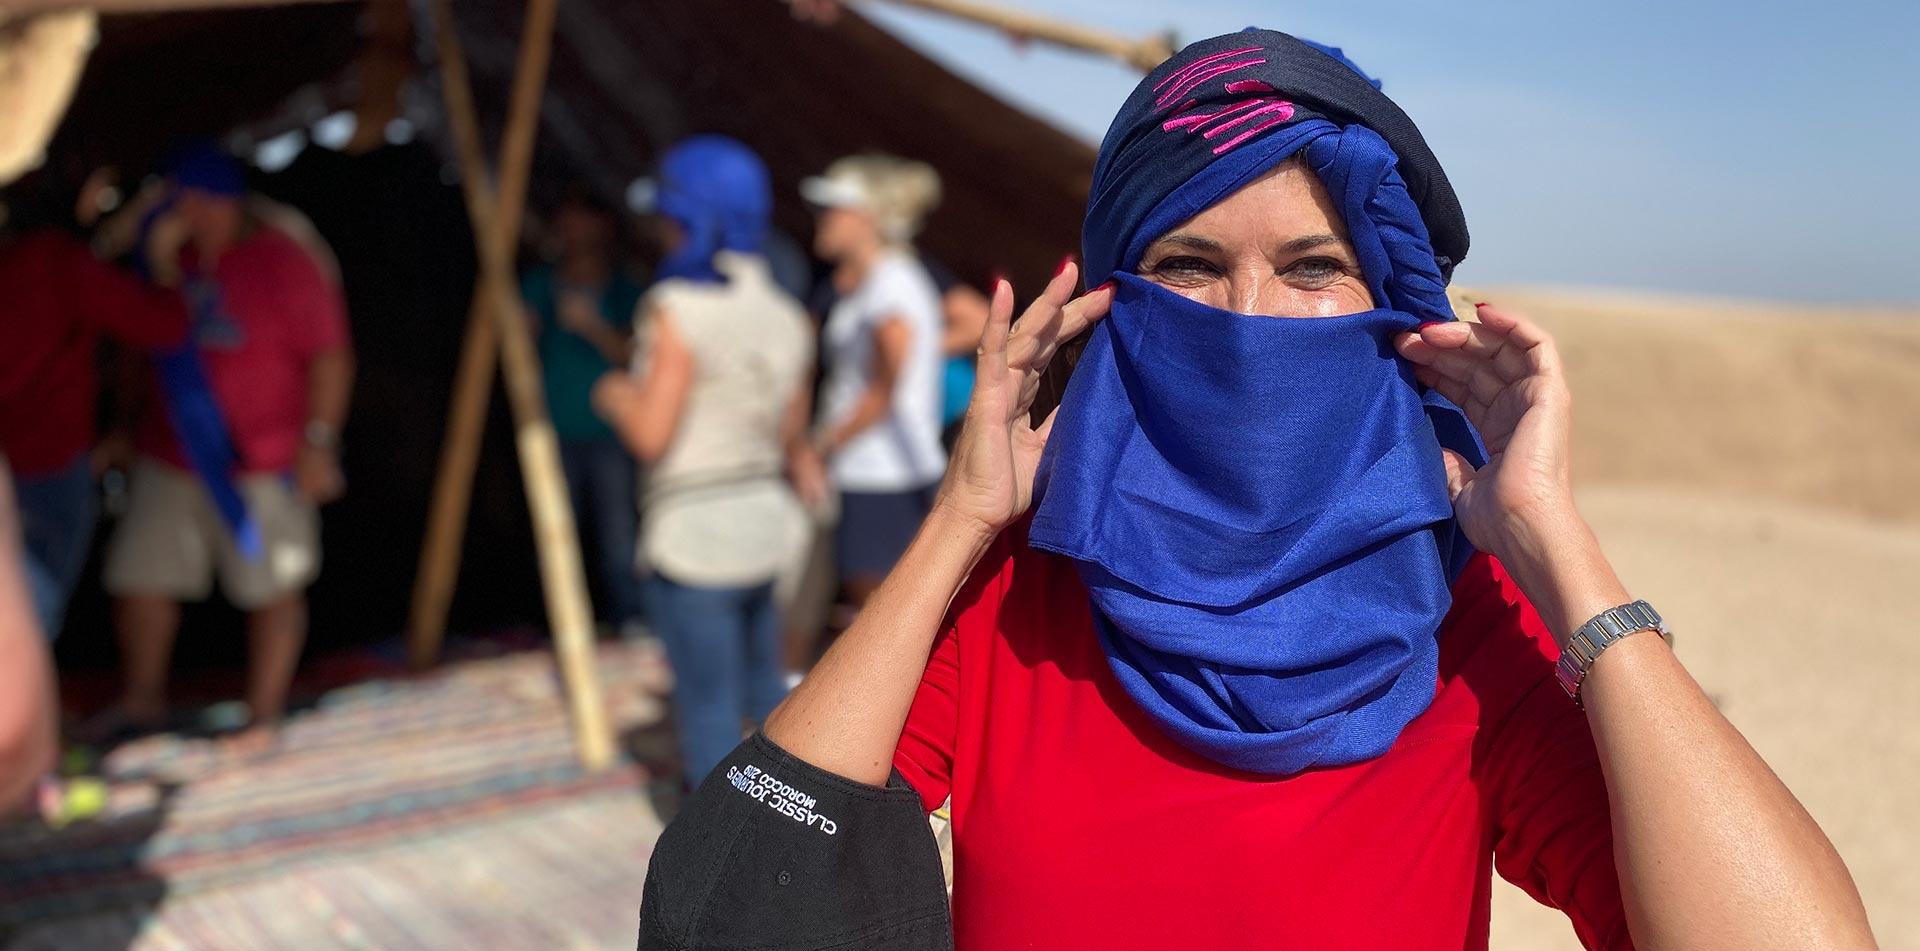 Woman wearing scarf